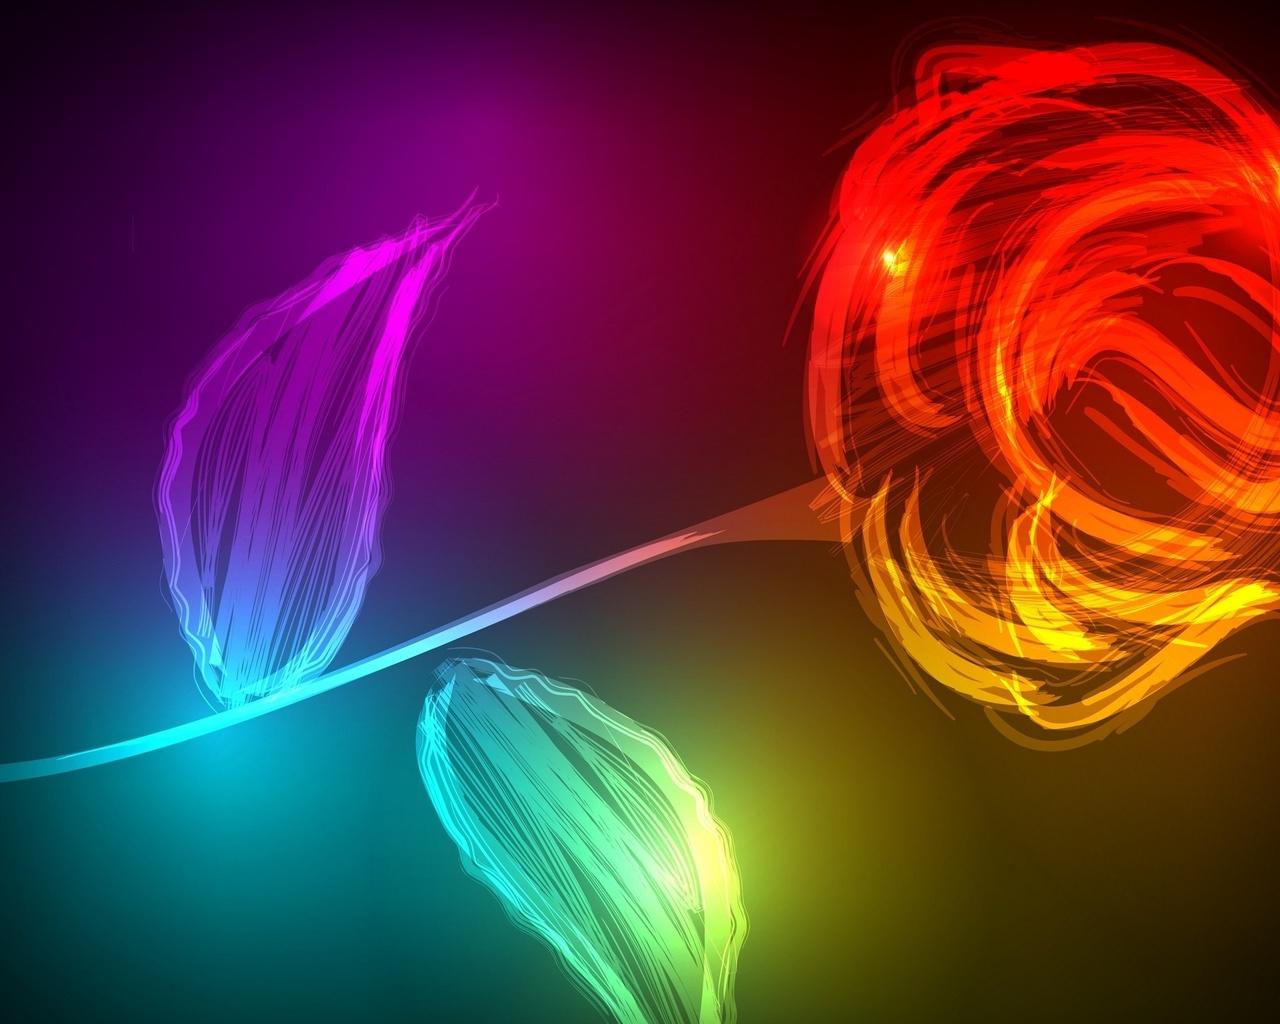 роза, цветок, фон, красный, жёлтый, цифра, красиво